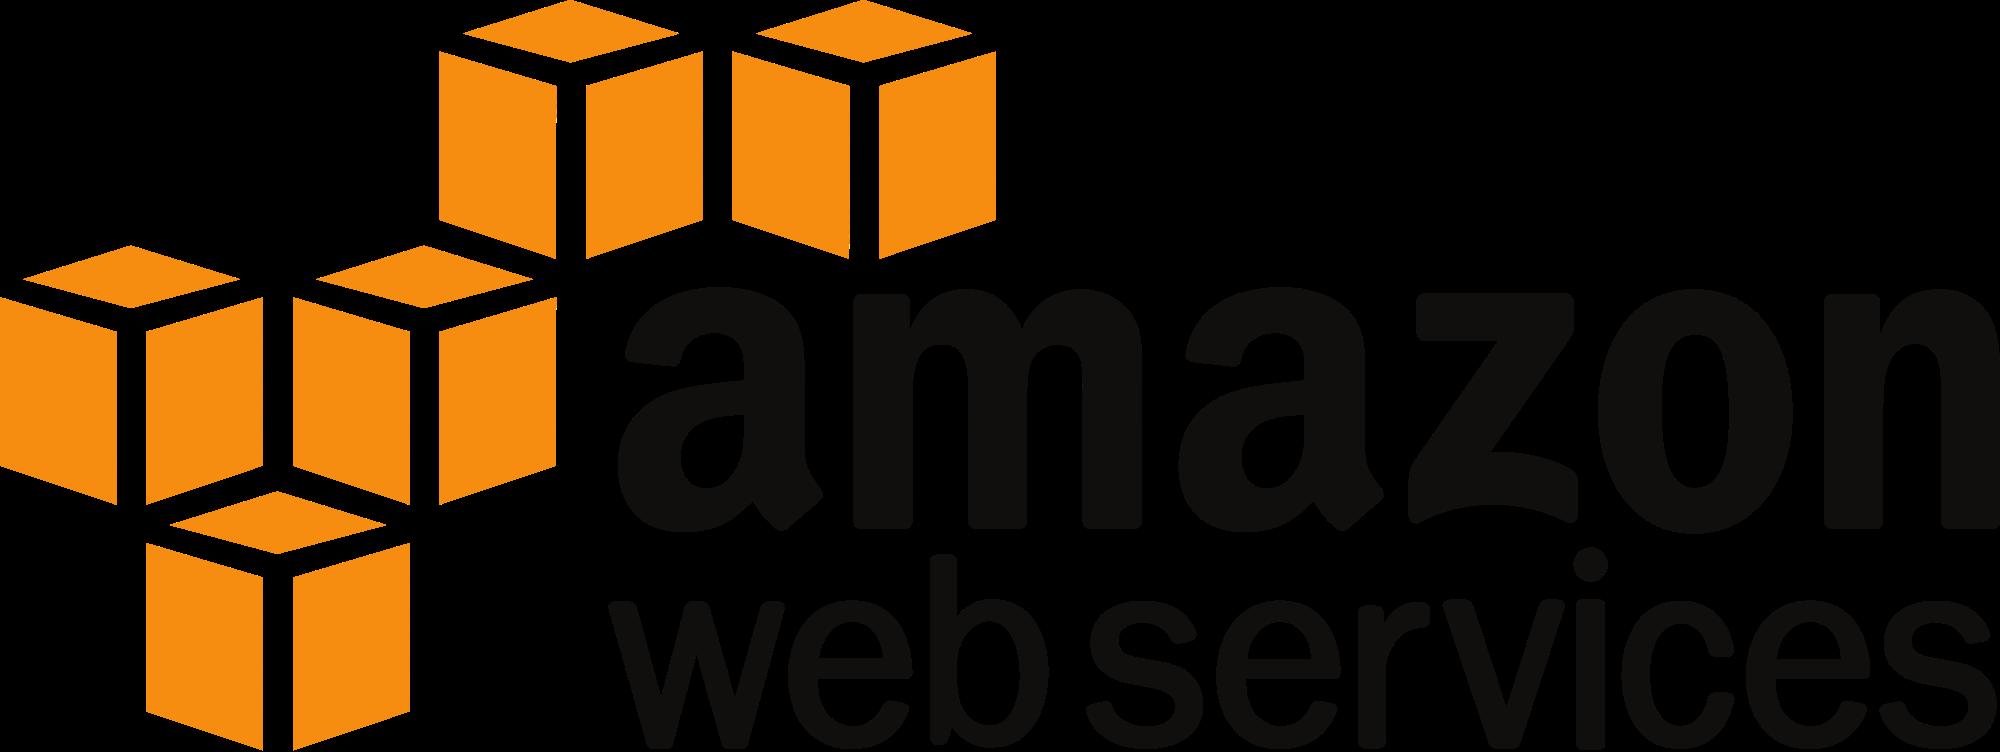 AWS logo